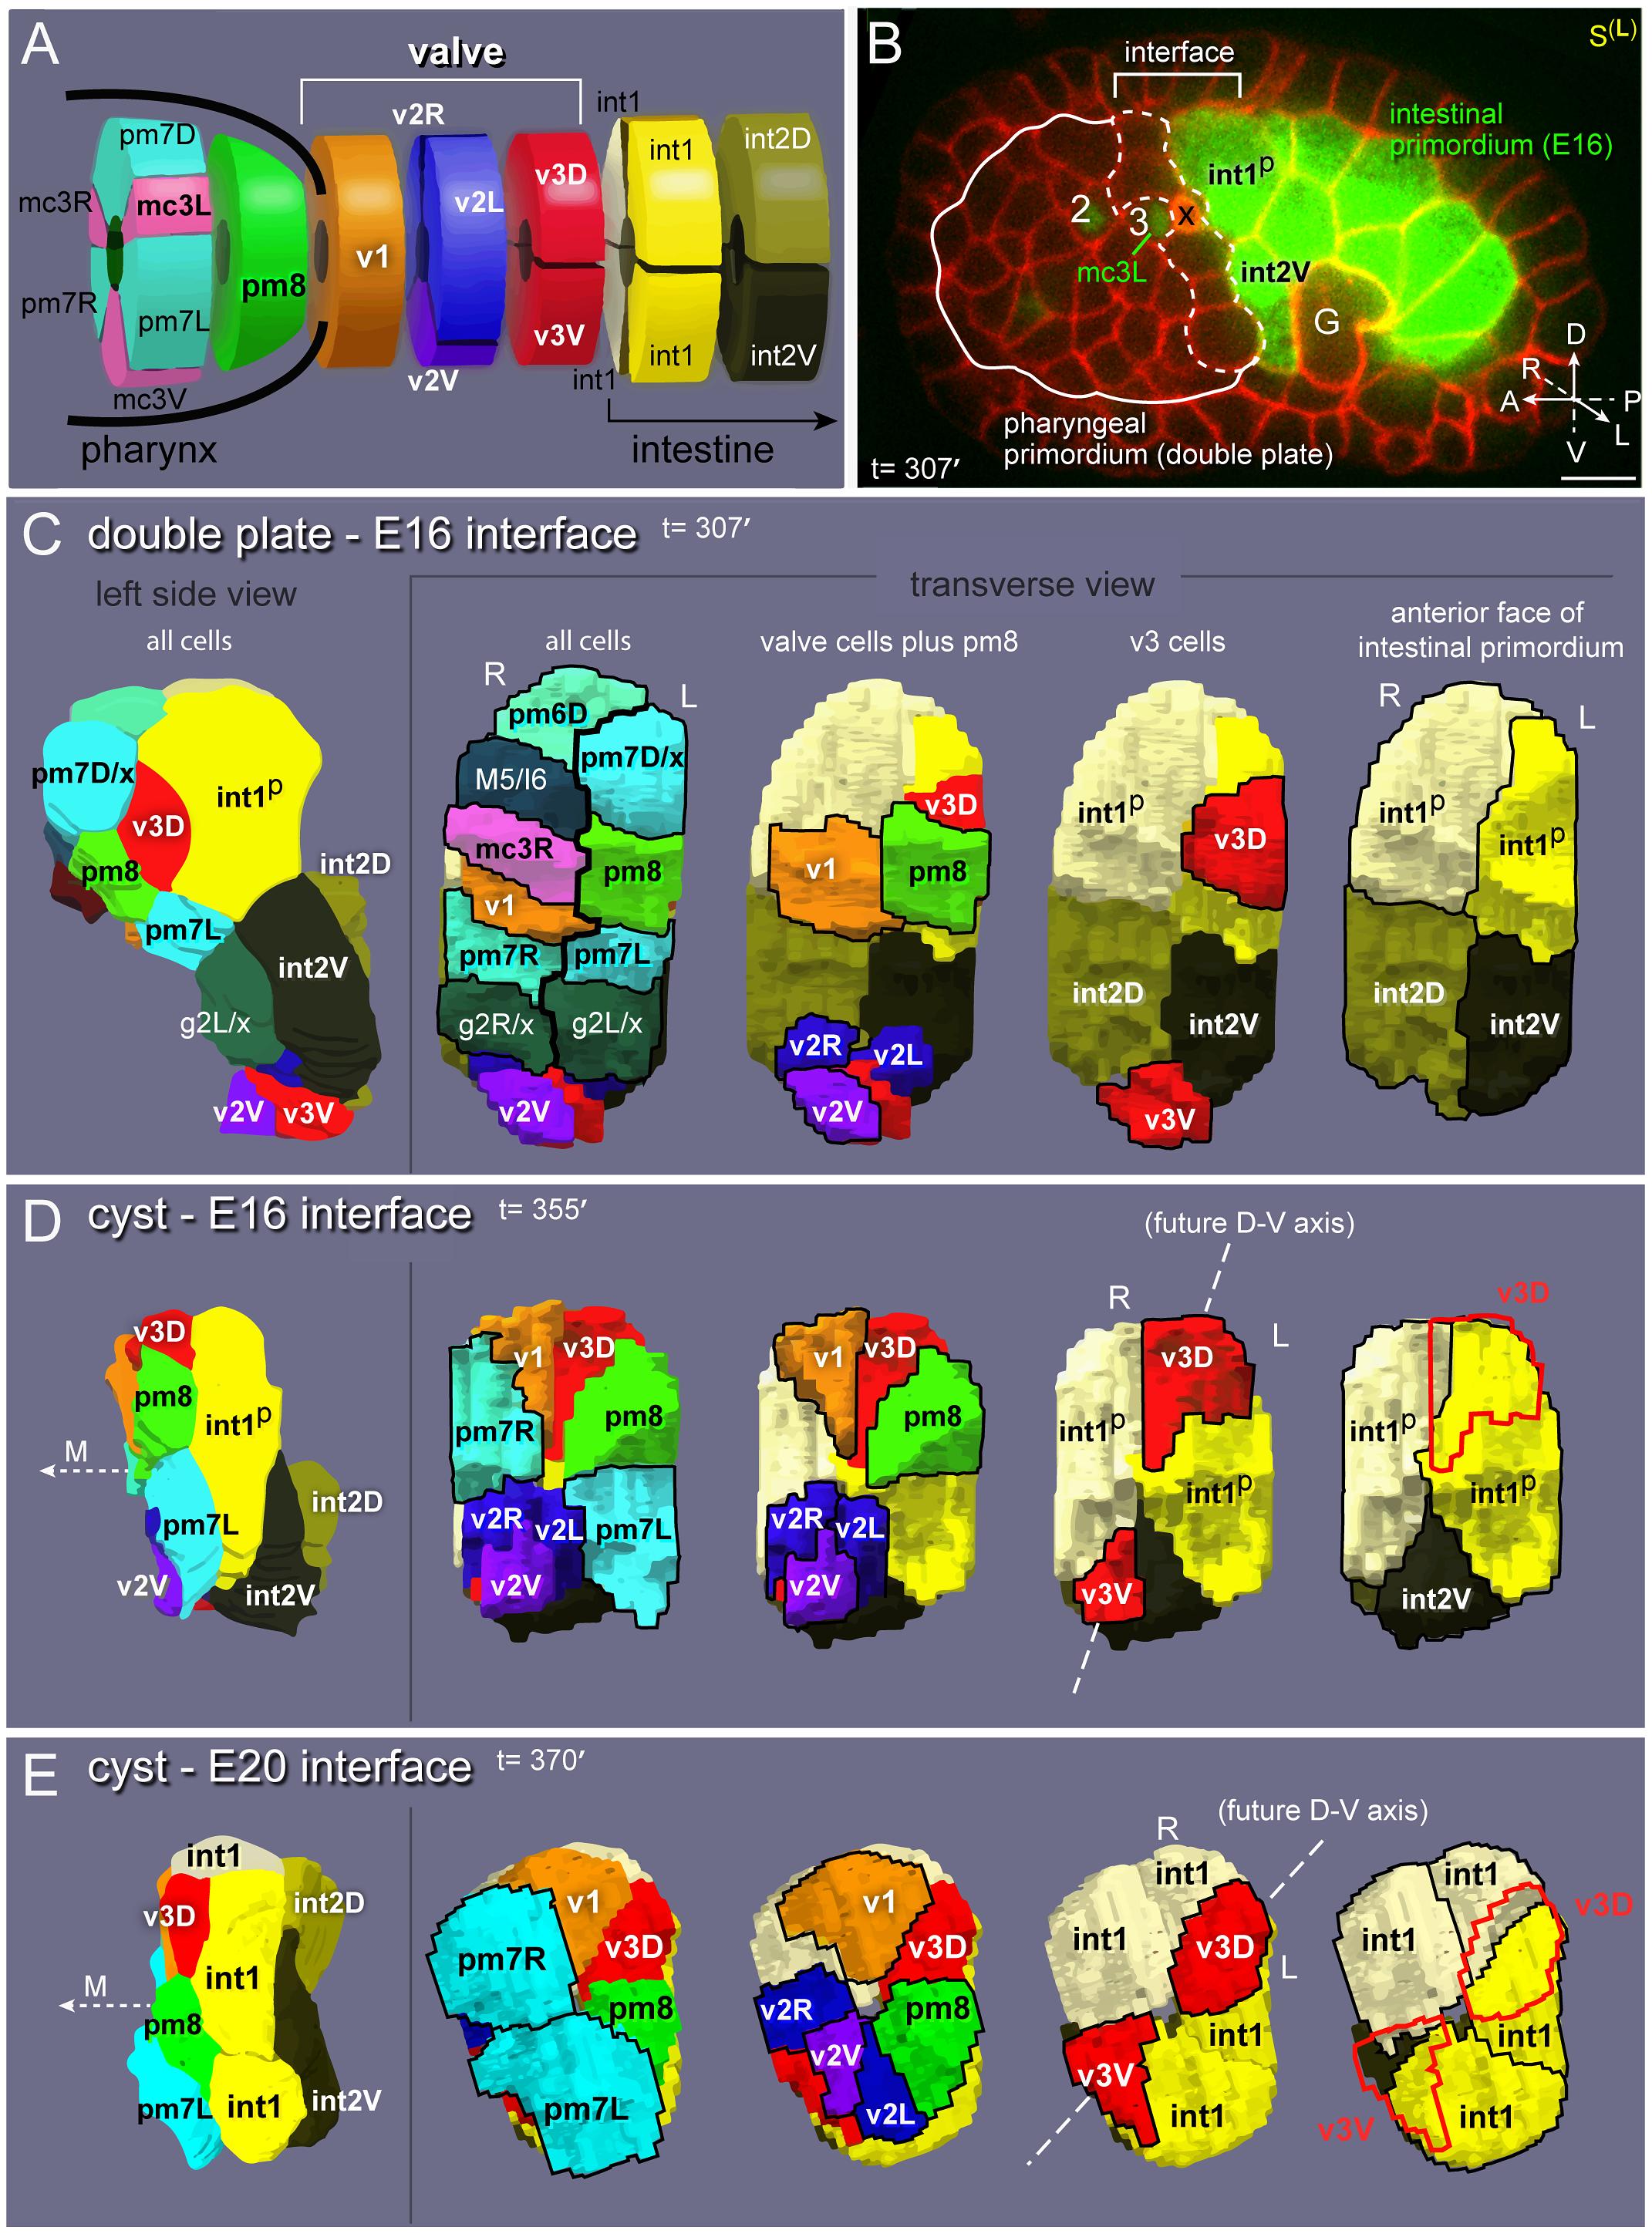 Valve anatomy and origins.